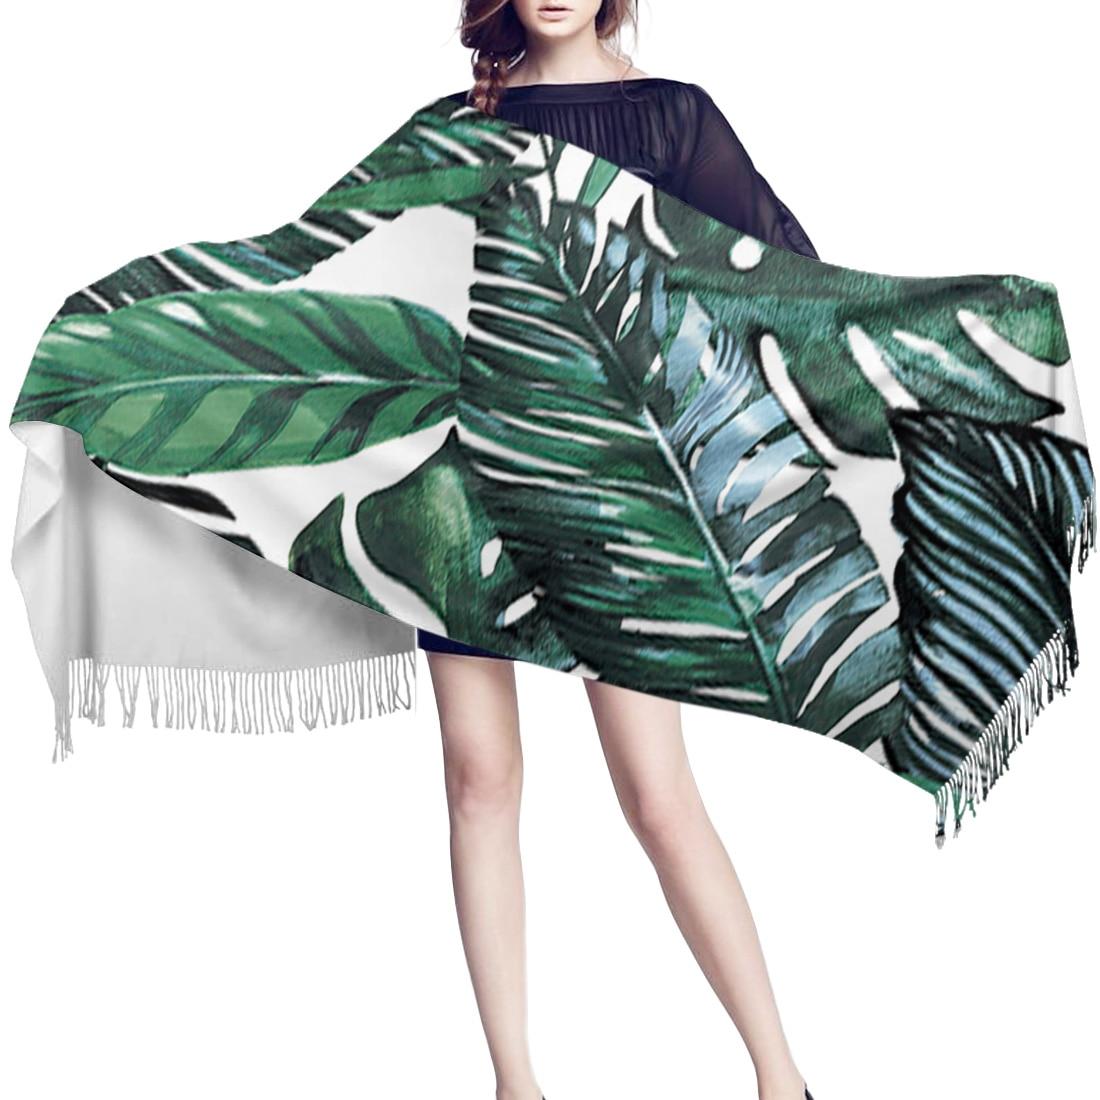 Invierno mujer bufanda Tropical planta Banana hoja verde cálido cachemir bufandas con chales Pashmina con borlas Mujer hombres señora envoltura